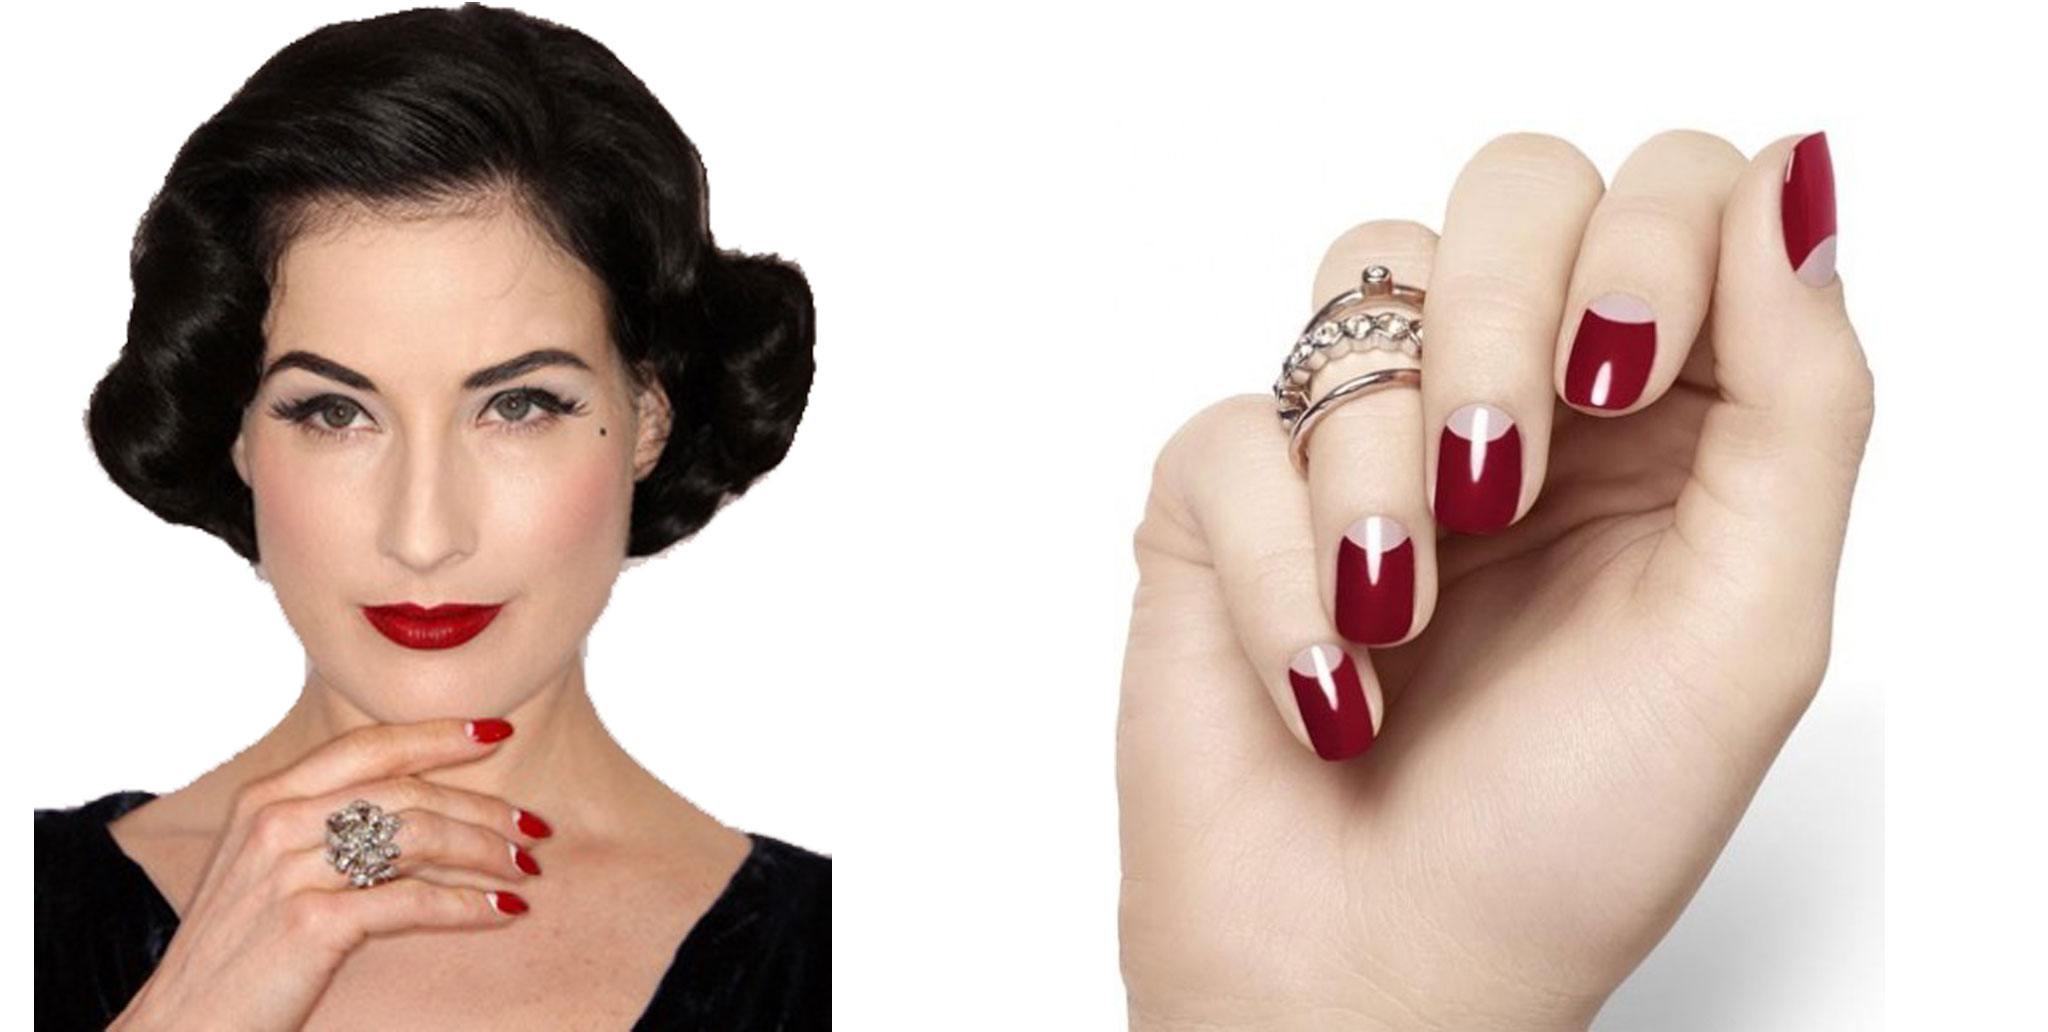 French manicure inversa